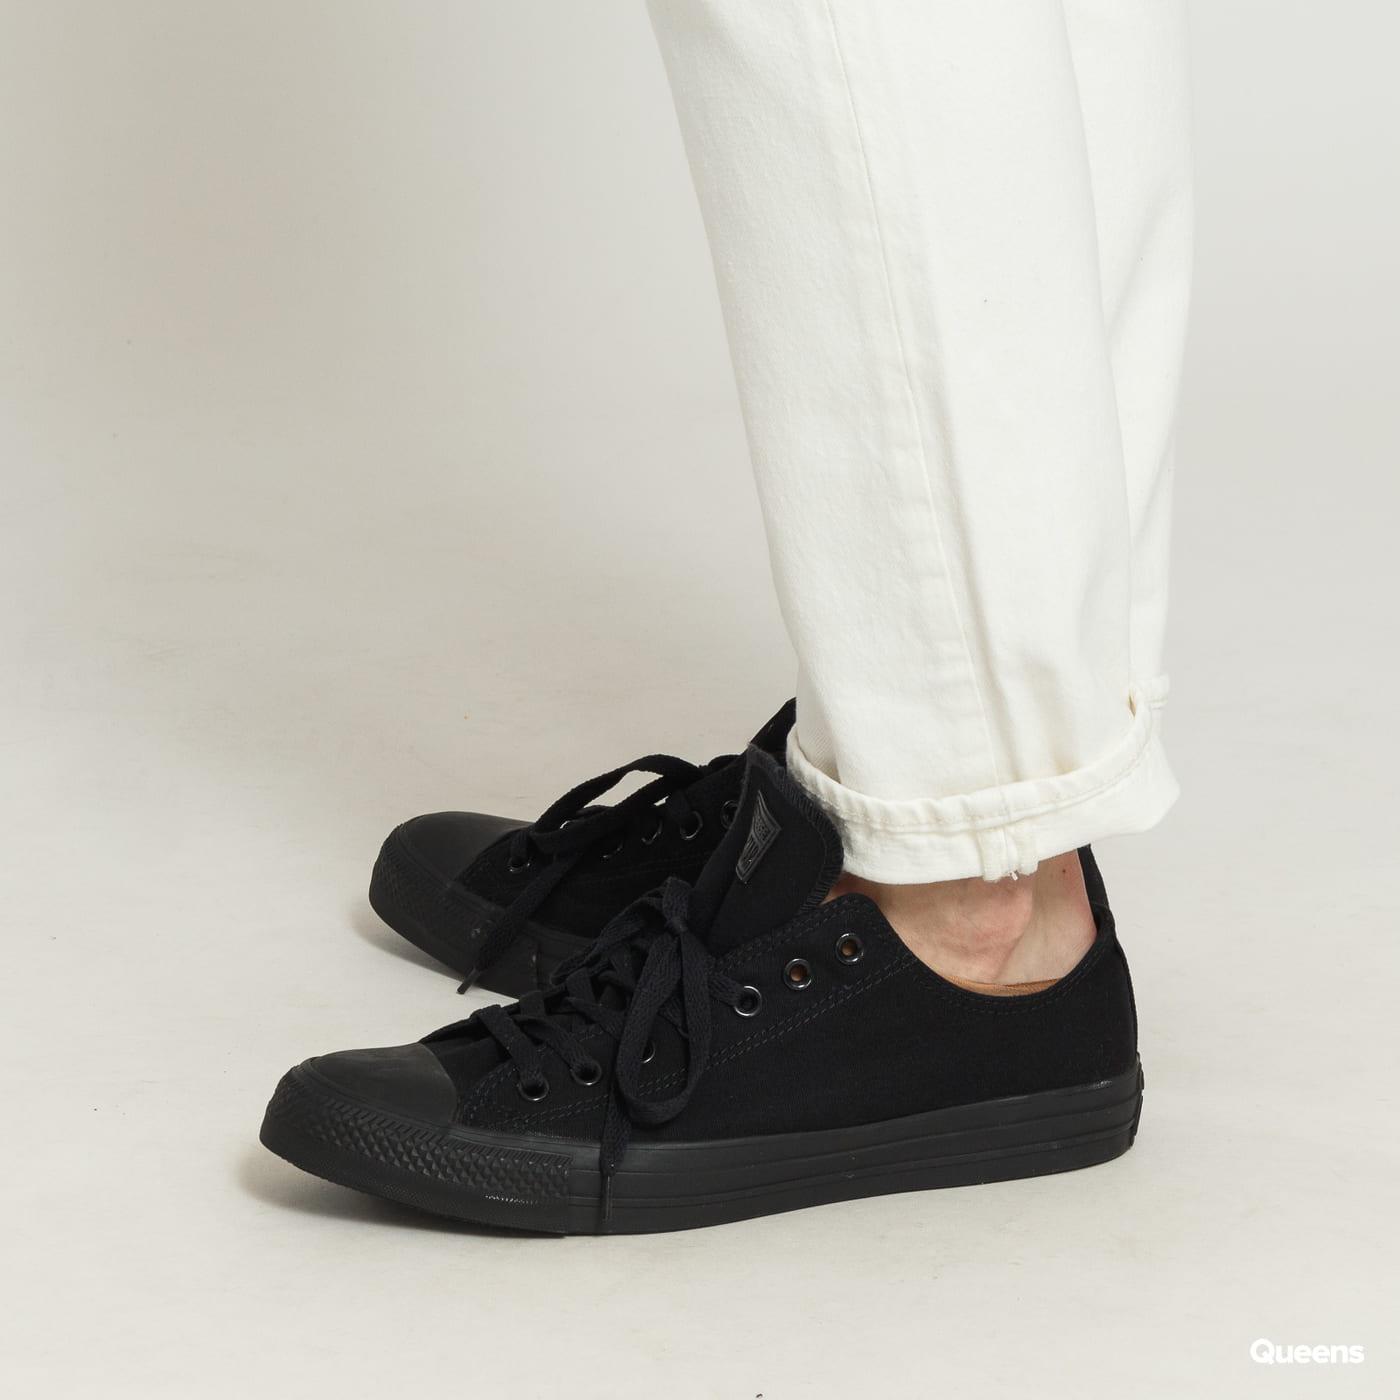 Levi's ® Justin Timberlake 501 Slim Taper white denim jt